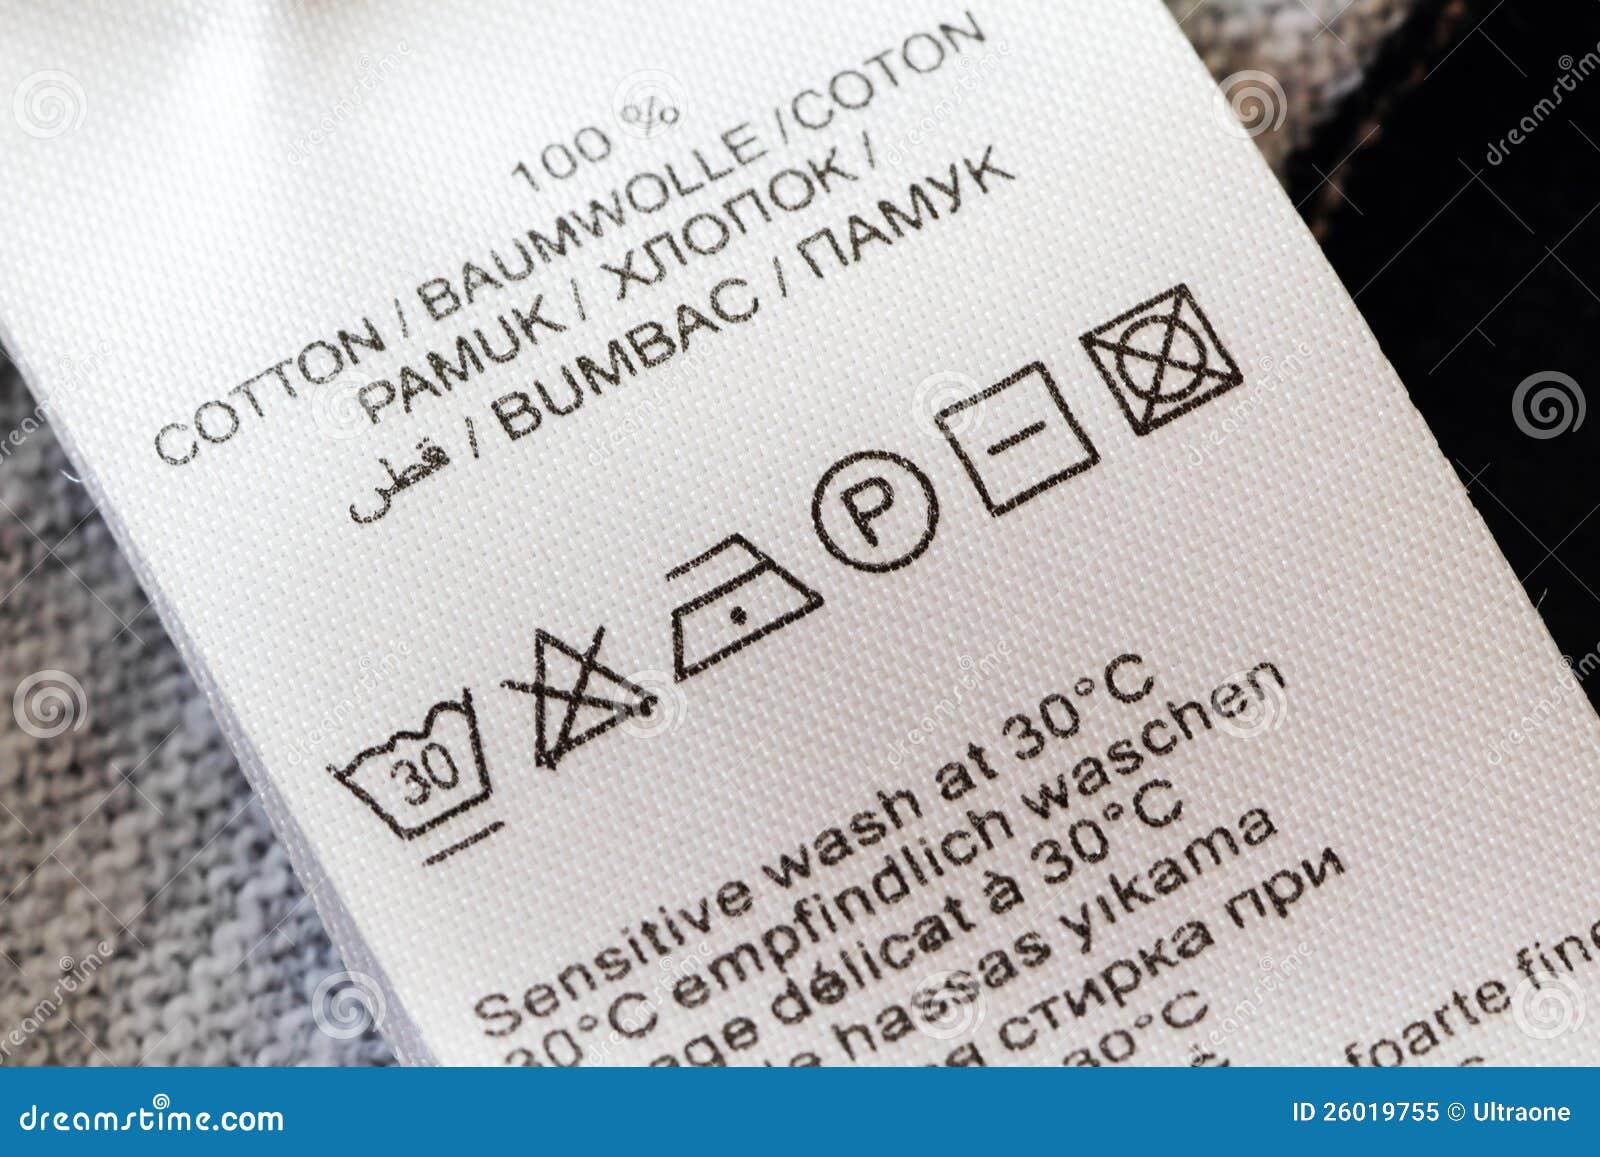 Laundry Care Label Royalty Free Stock Photo - Image: 26019755